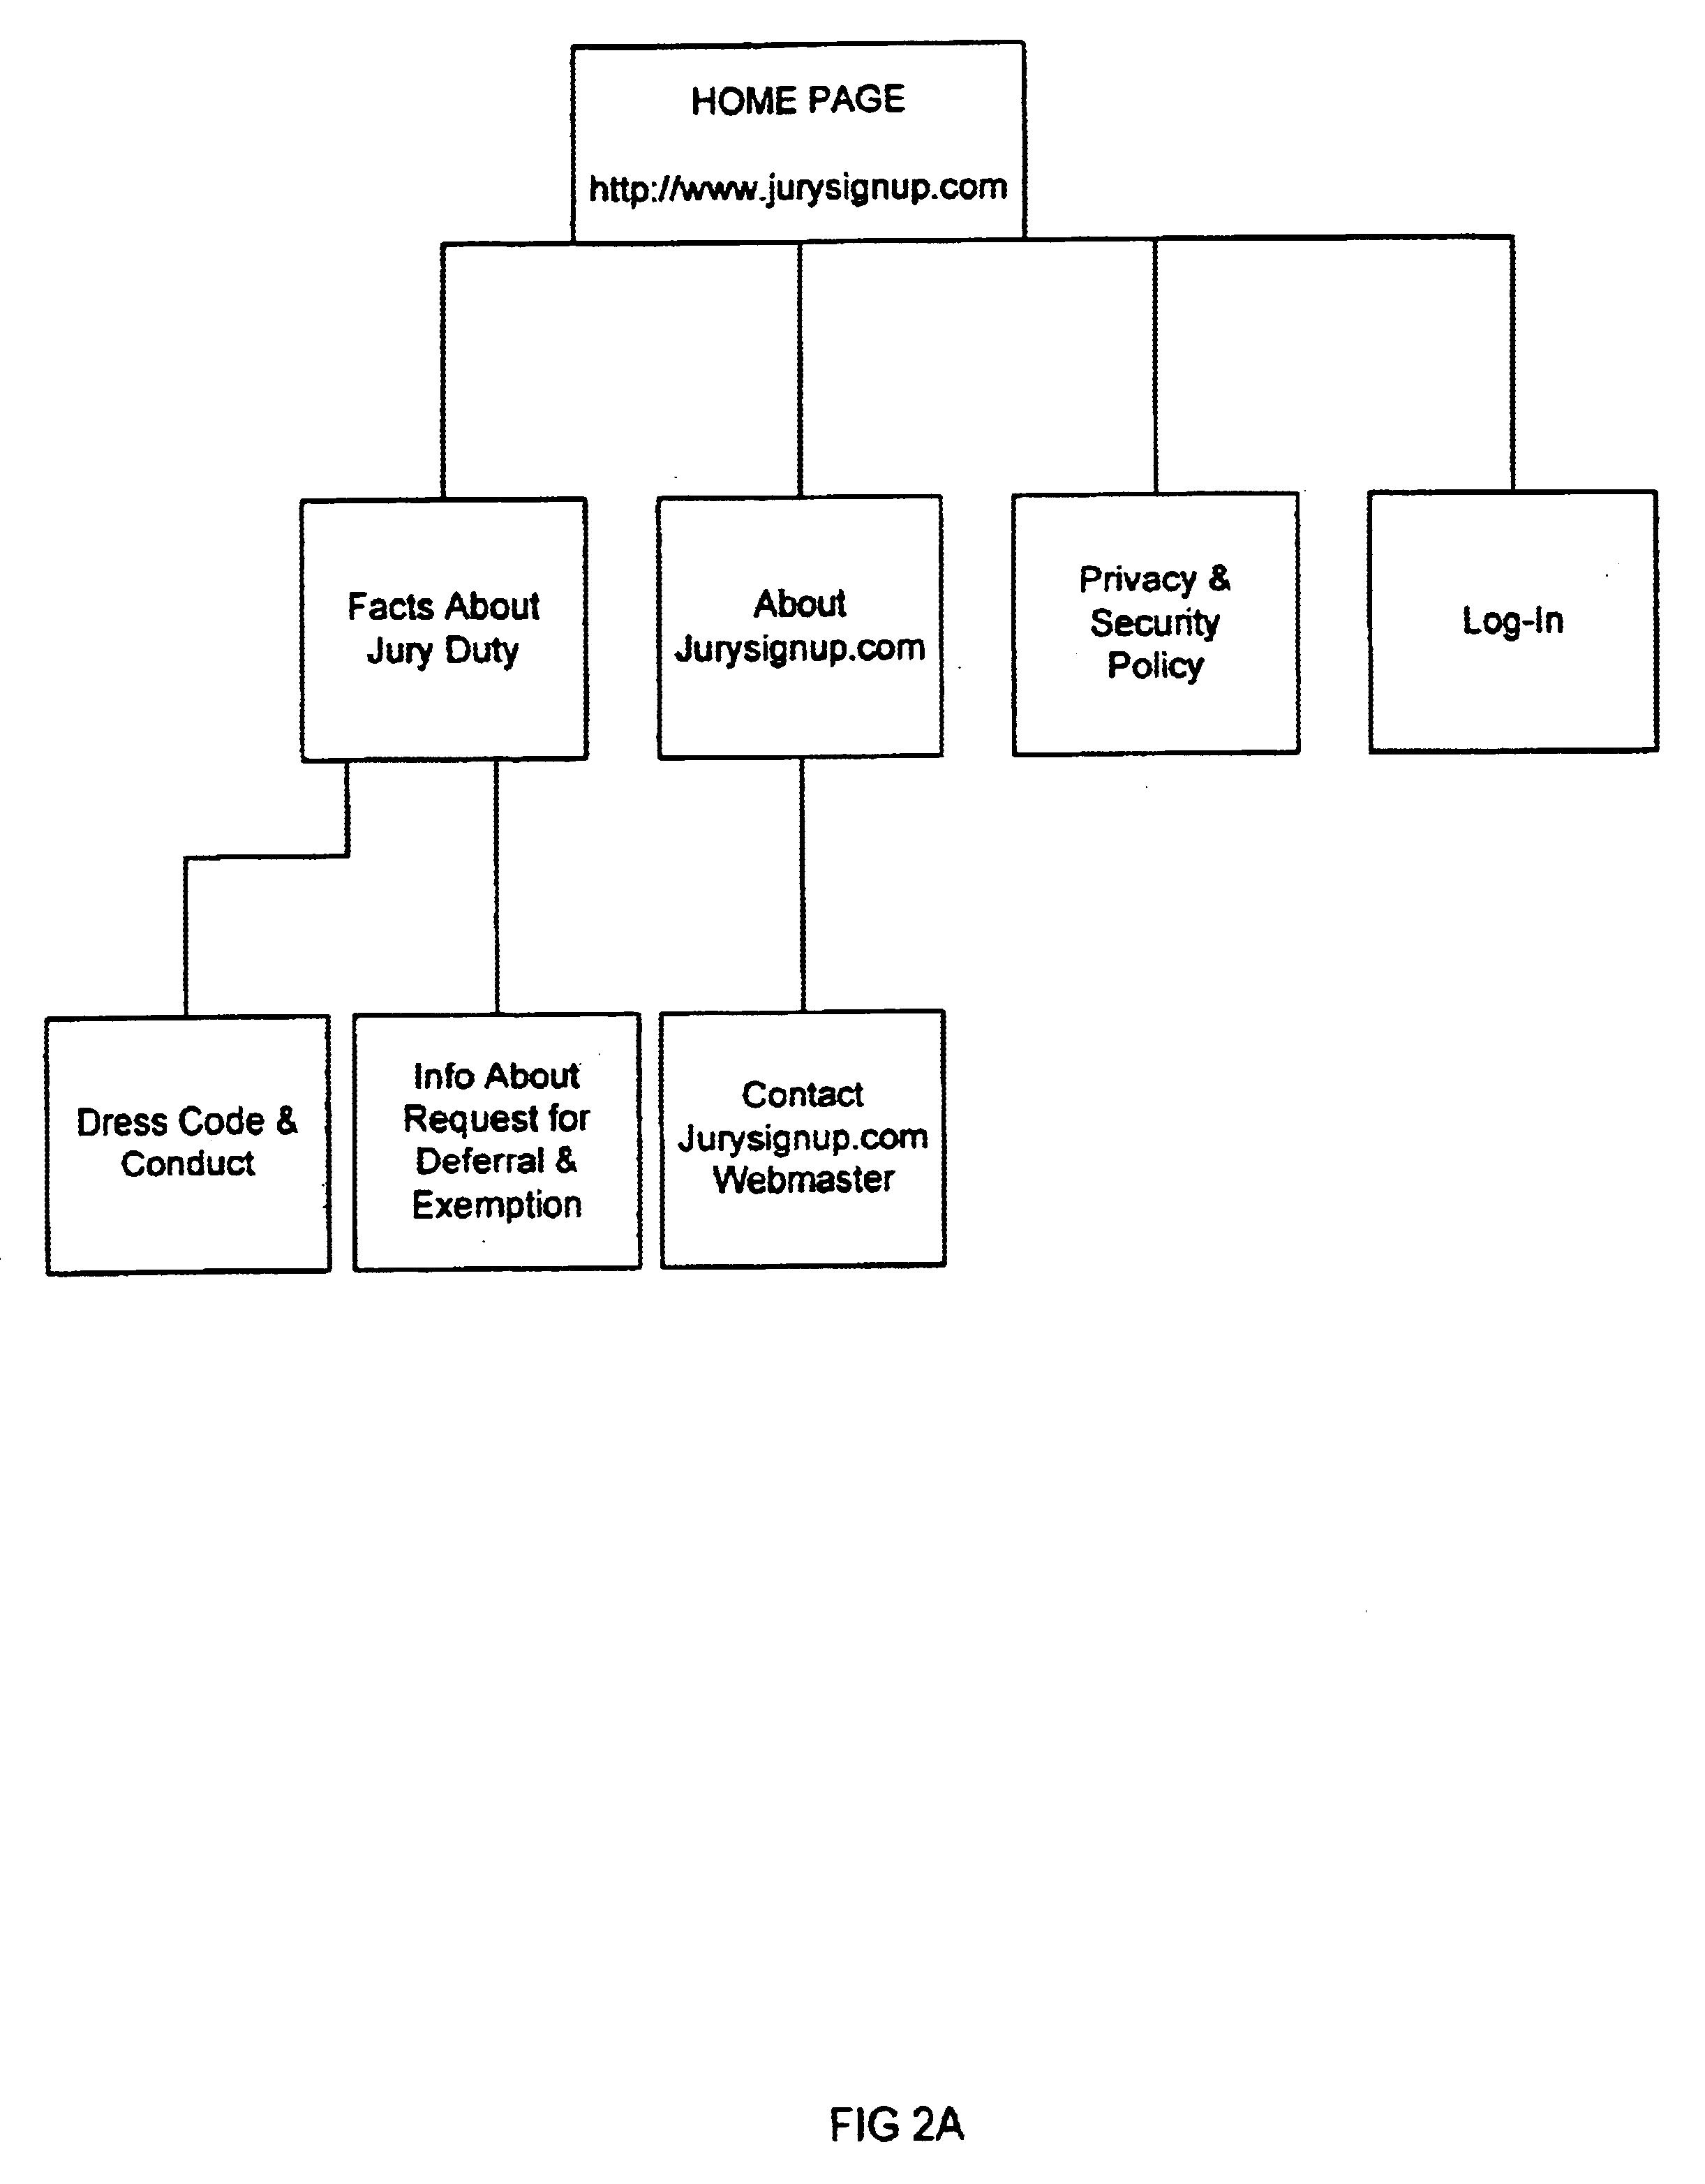 Patent Docs